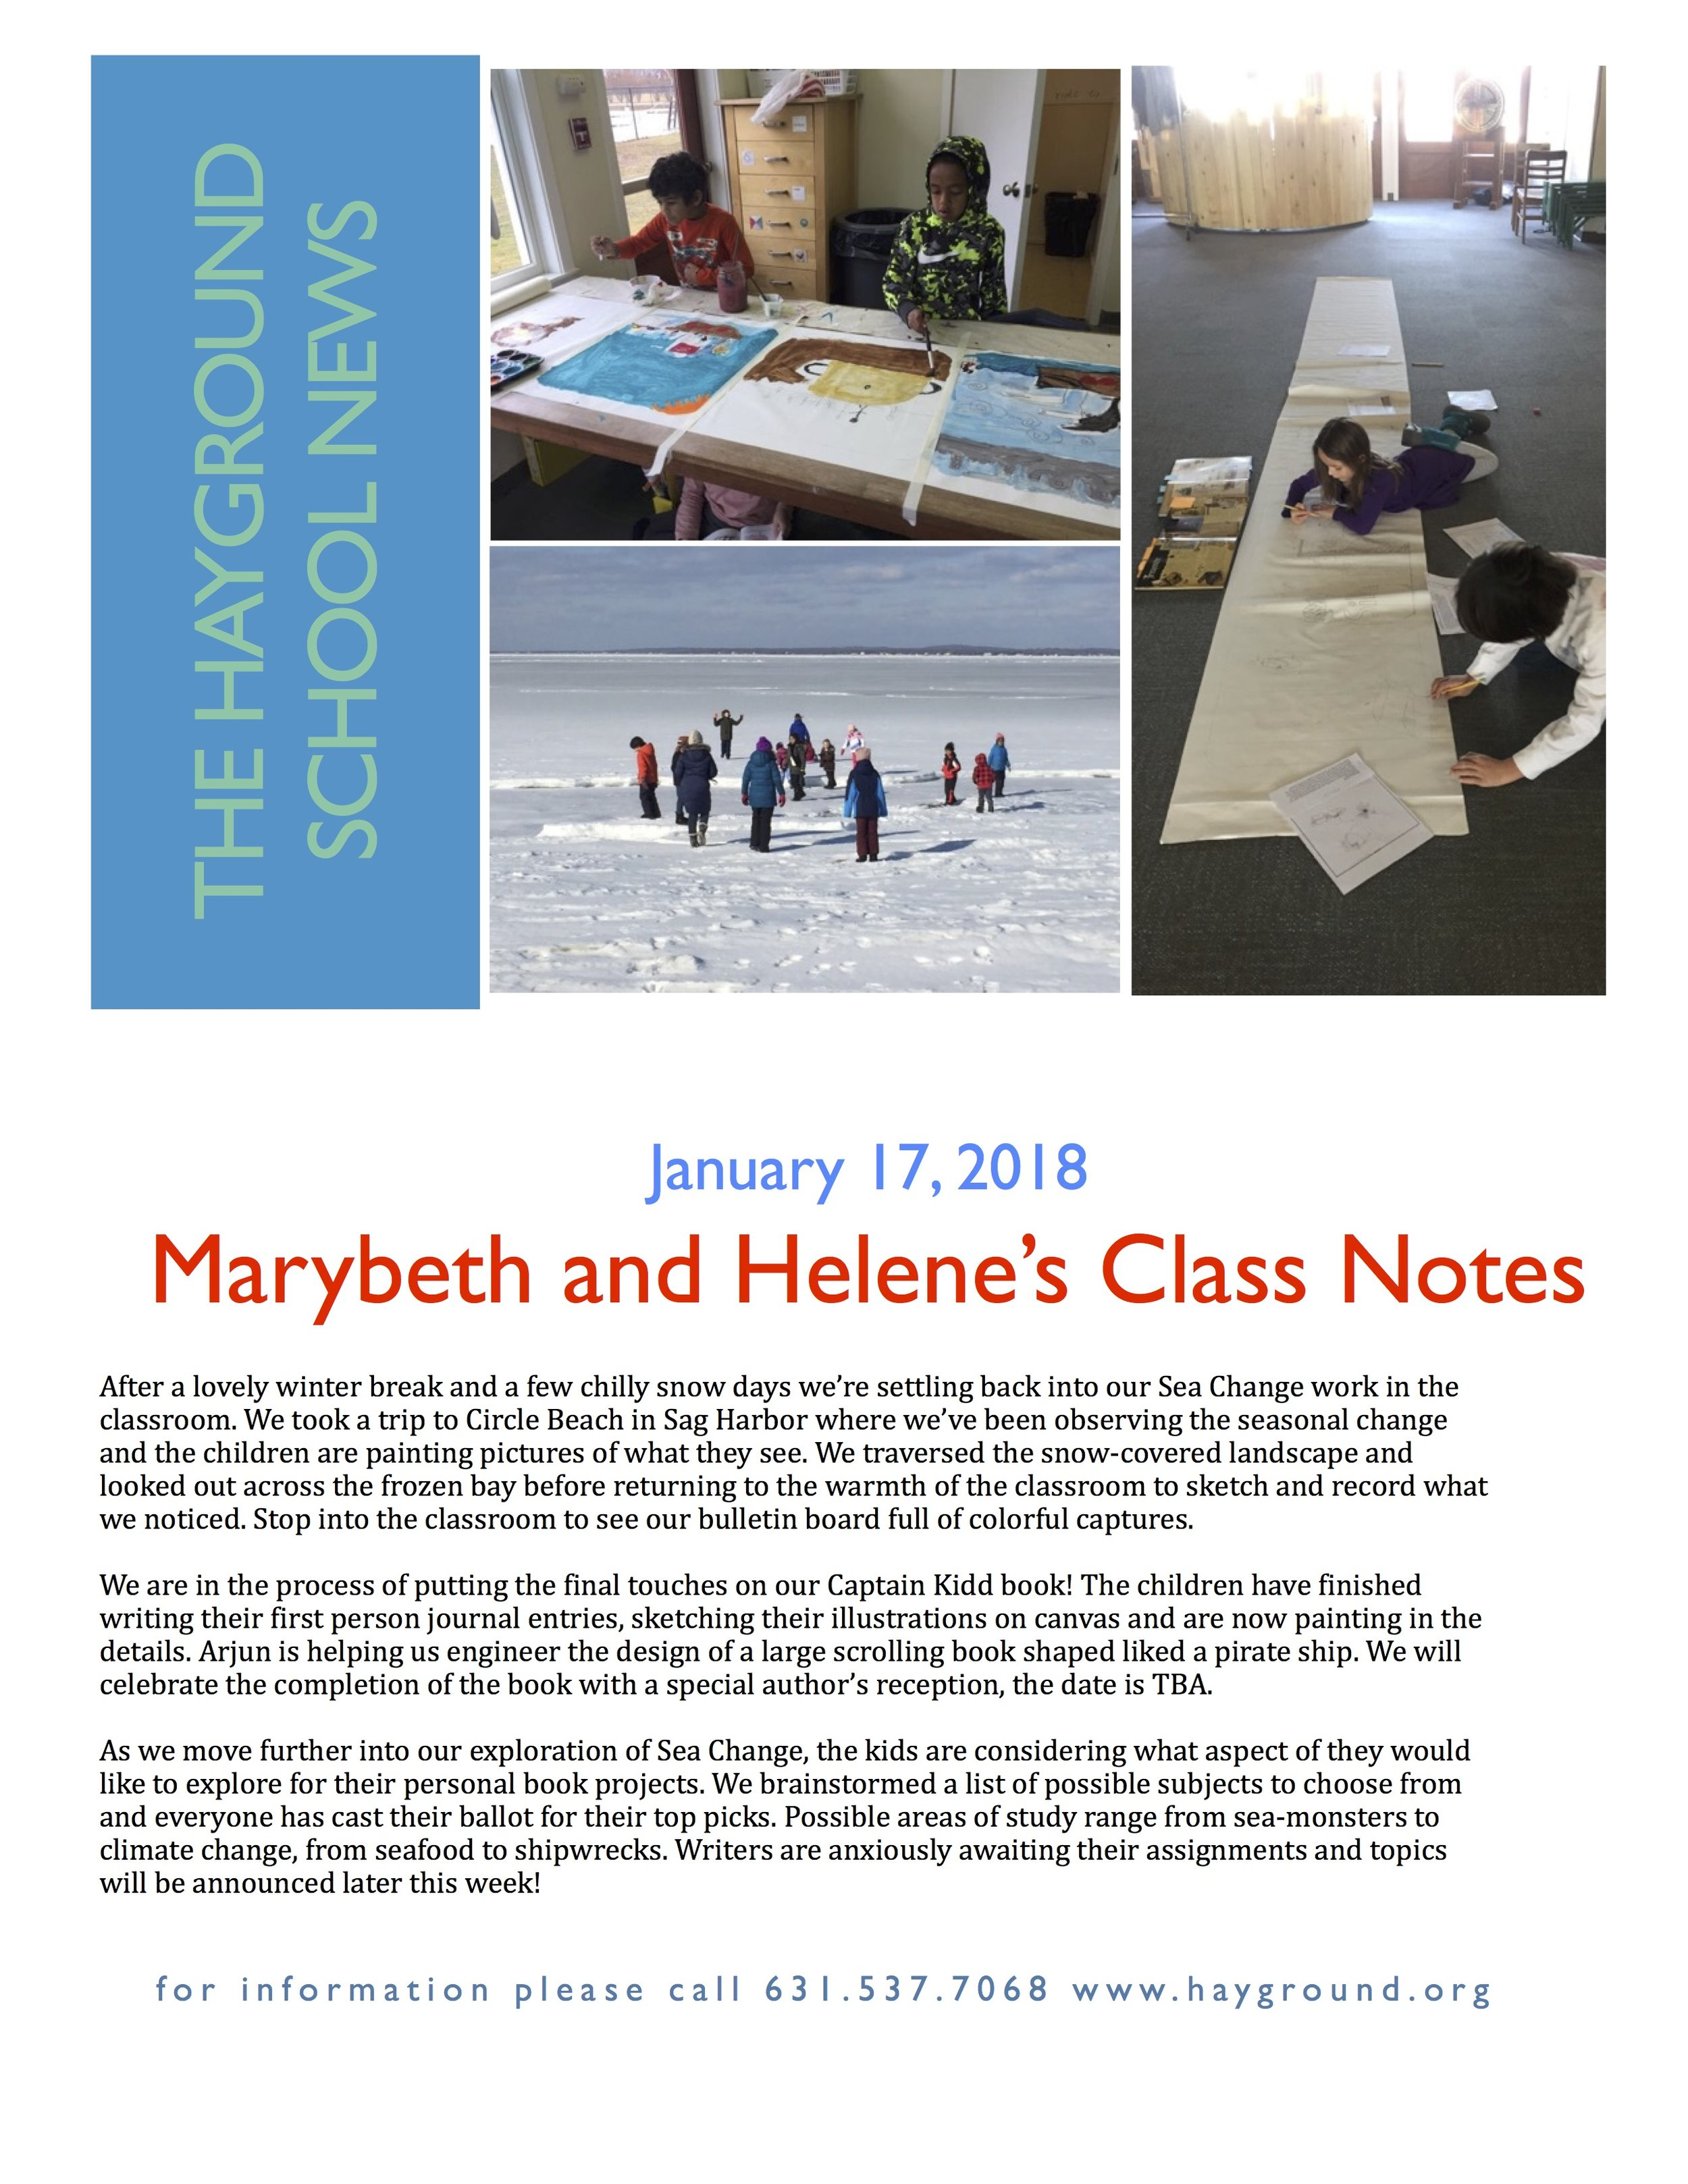 Class Notes 01-17-18 copy 2.jpg